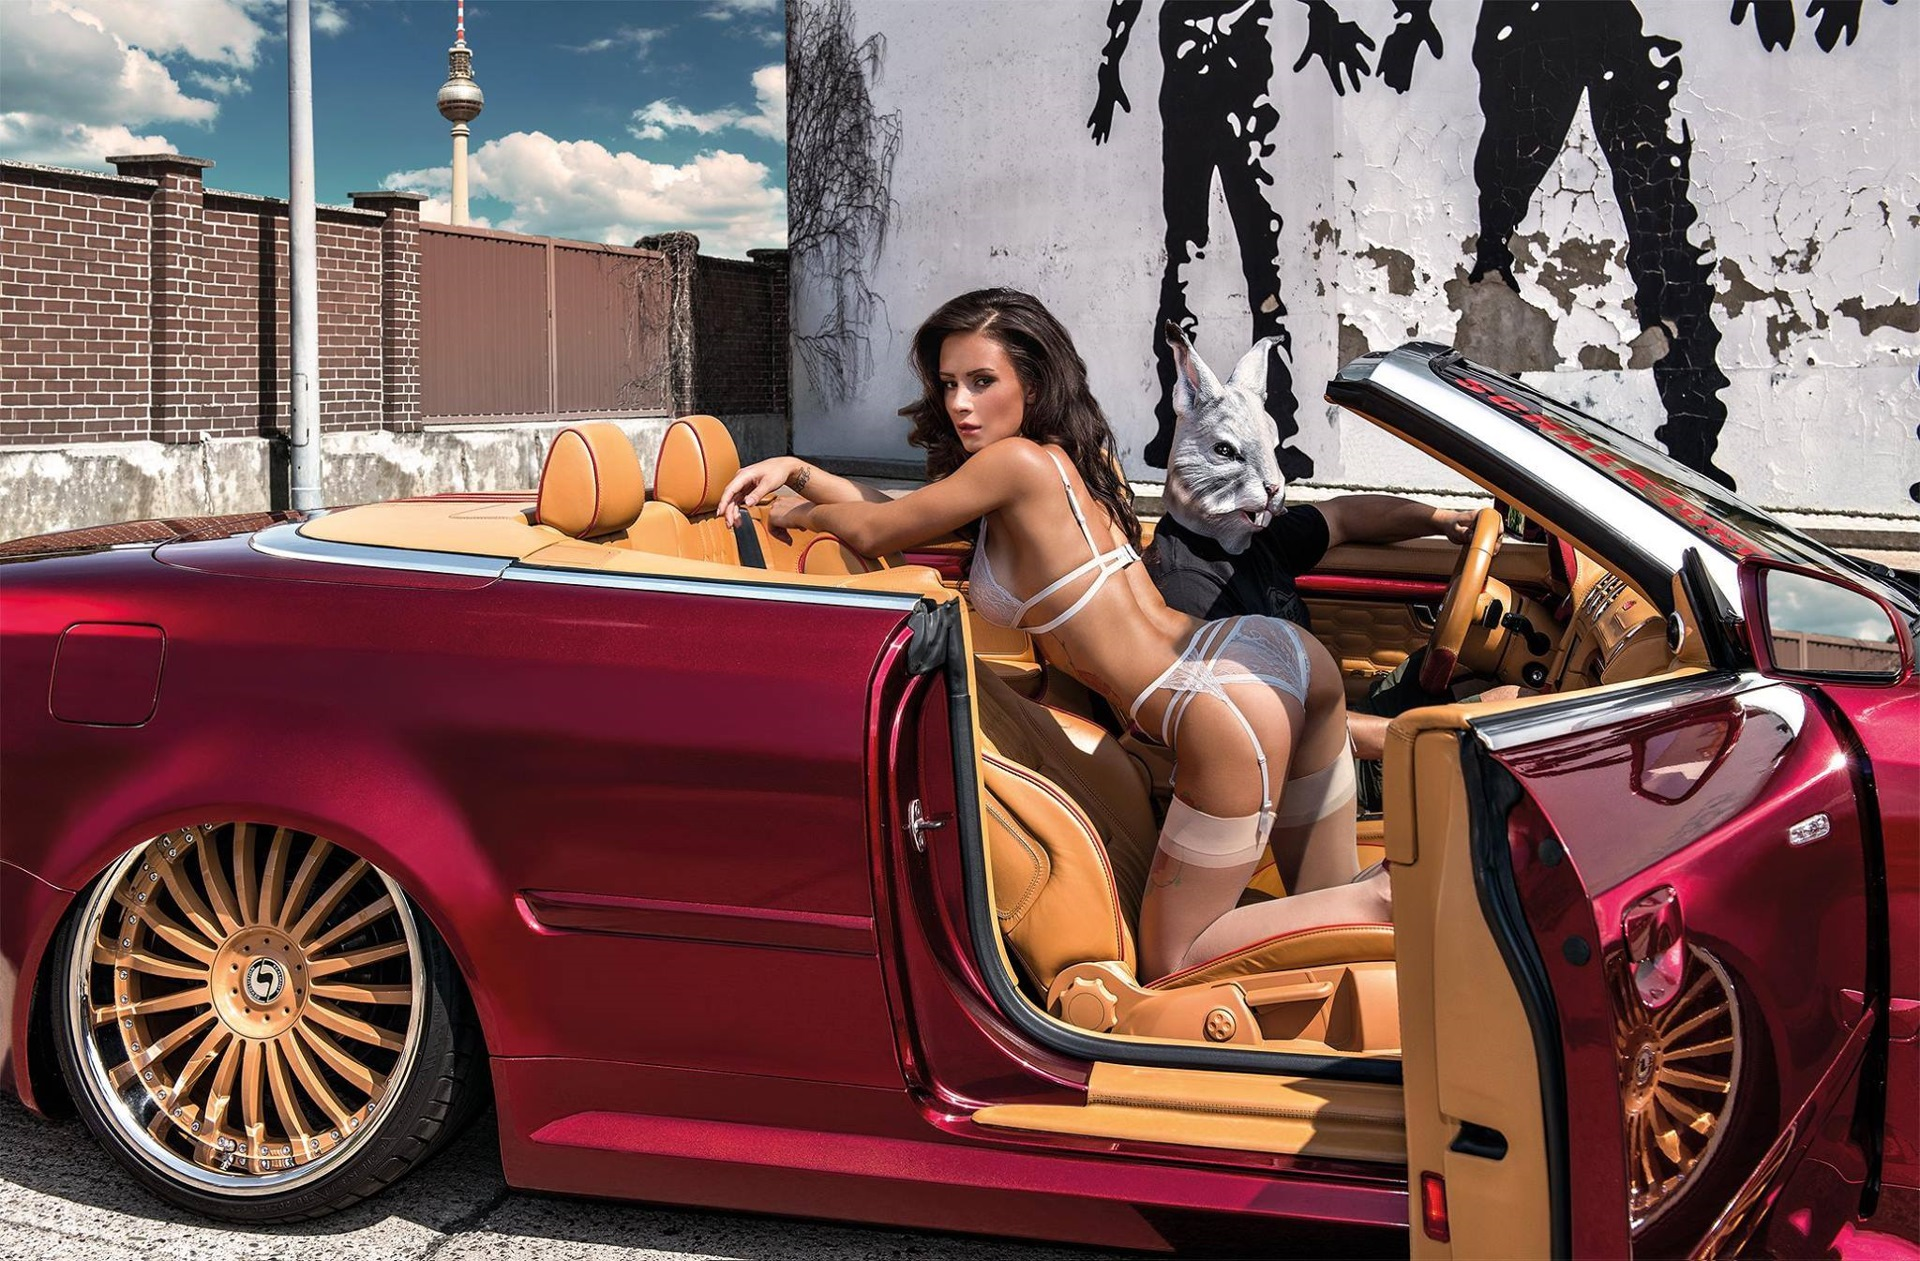 Эро девушки в рекламе авто